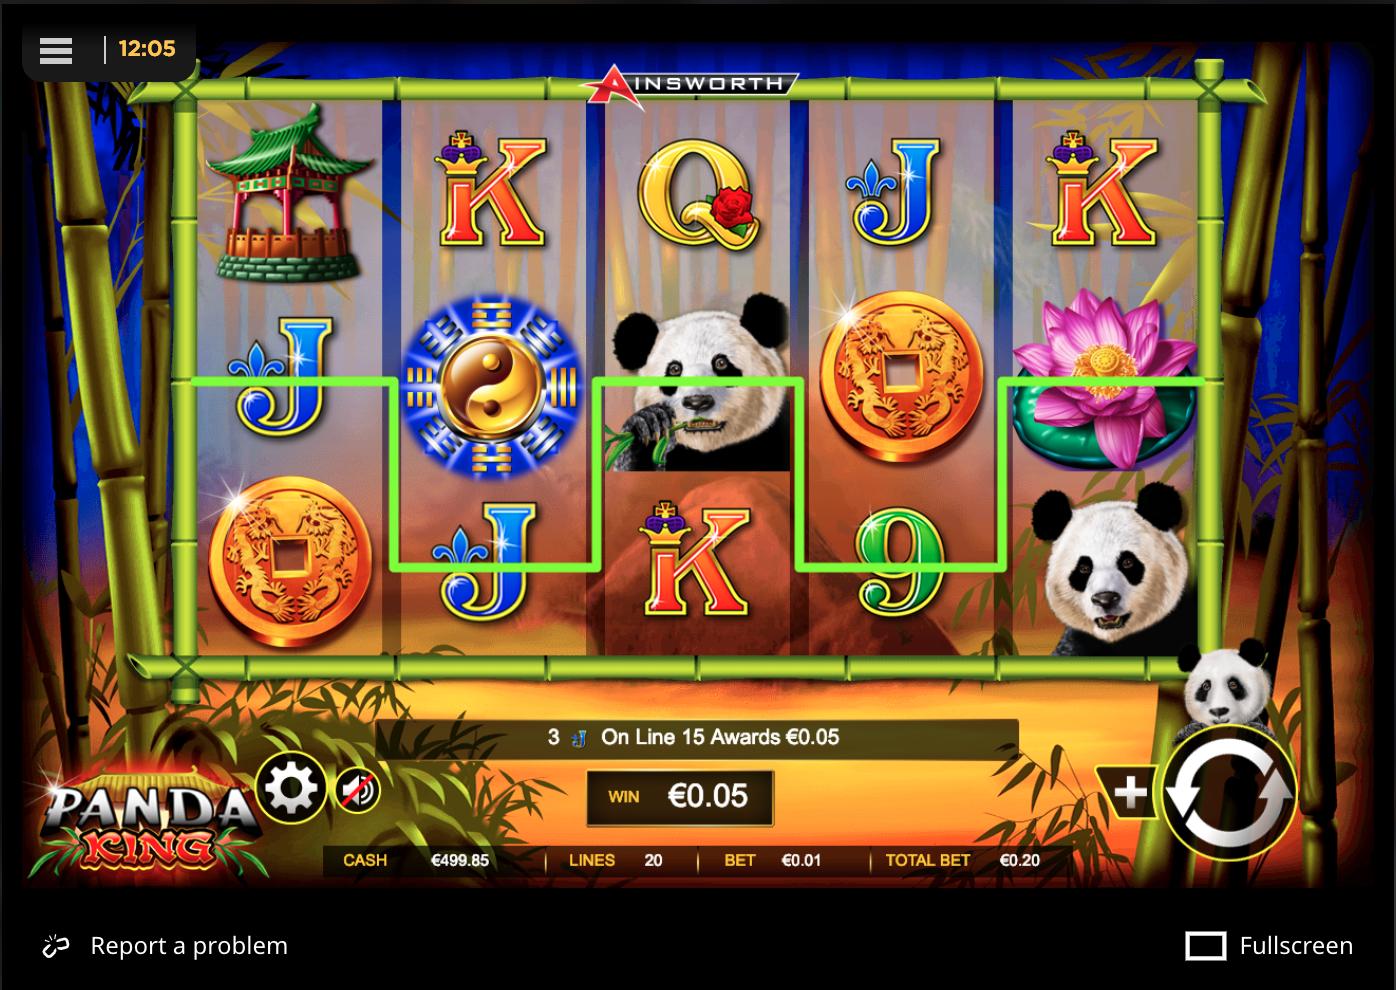 Panda King - simple win